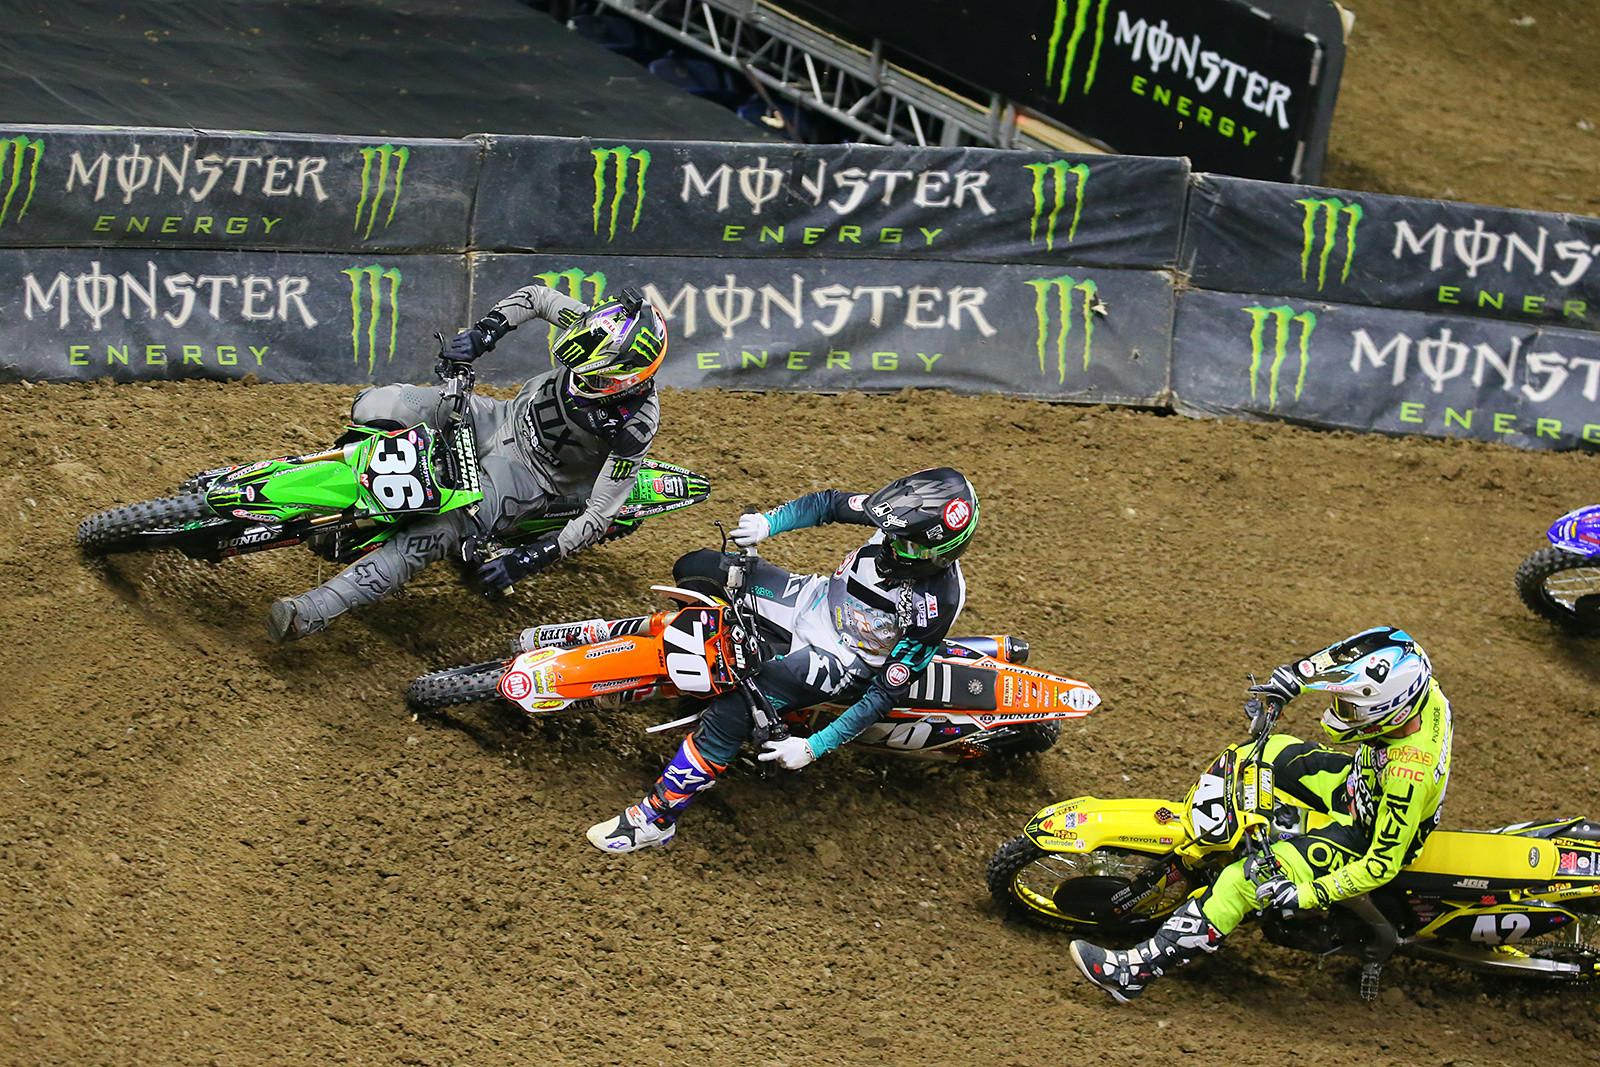 Adam Cianciarulo, Dakota Alix, and Kyle Cunningham - Photo Blast: Detroit - Motocross Pictures - Vital MX